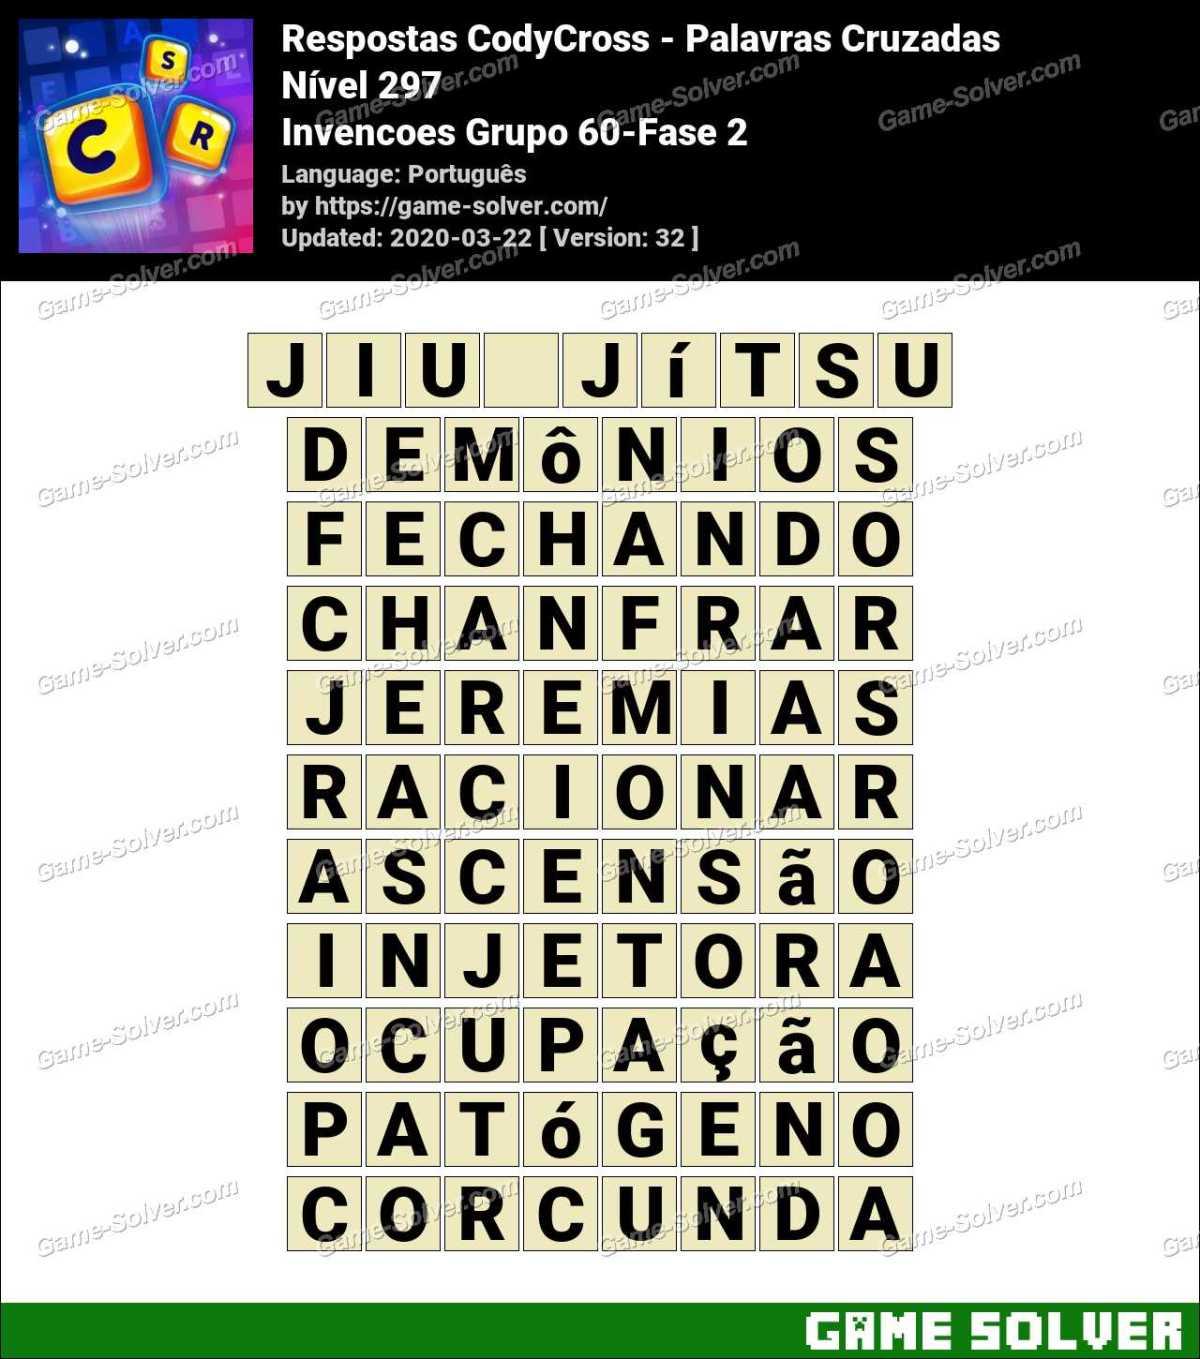 Respostas CodyCross Invencoes Grupo 60-Fase 2